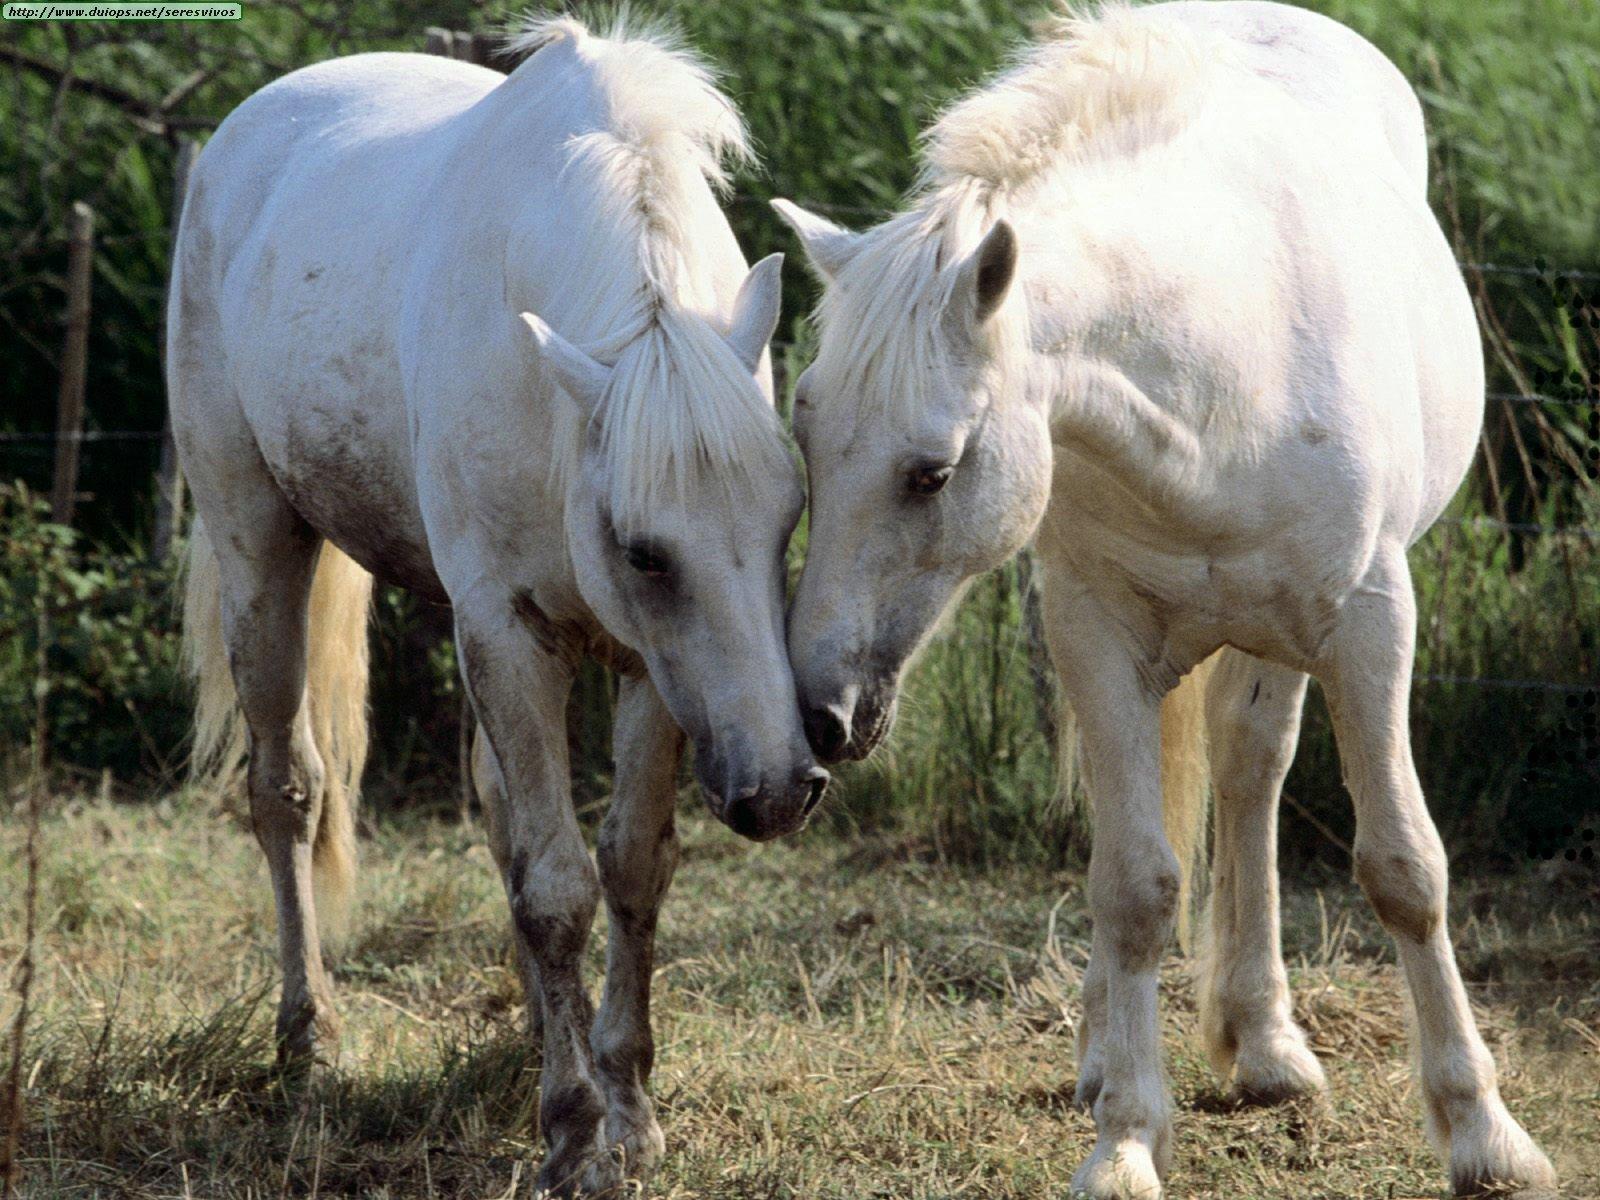 http://www.duiops.net/seresvivos/galeria/caballos/Animals%20Horses_Being%20Nosey.jpg